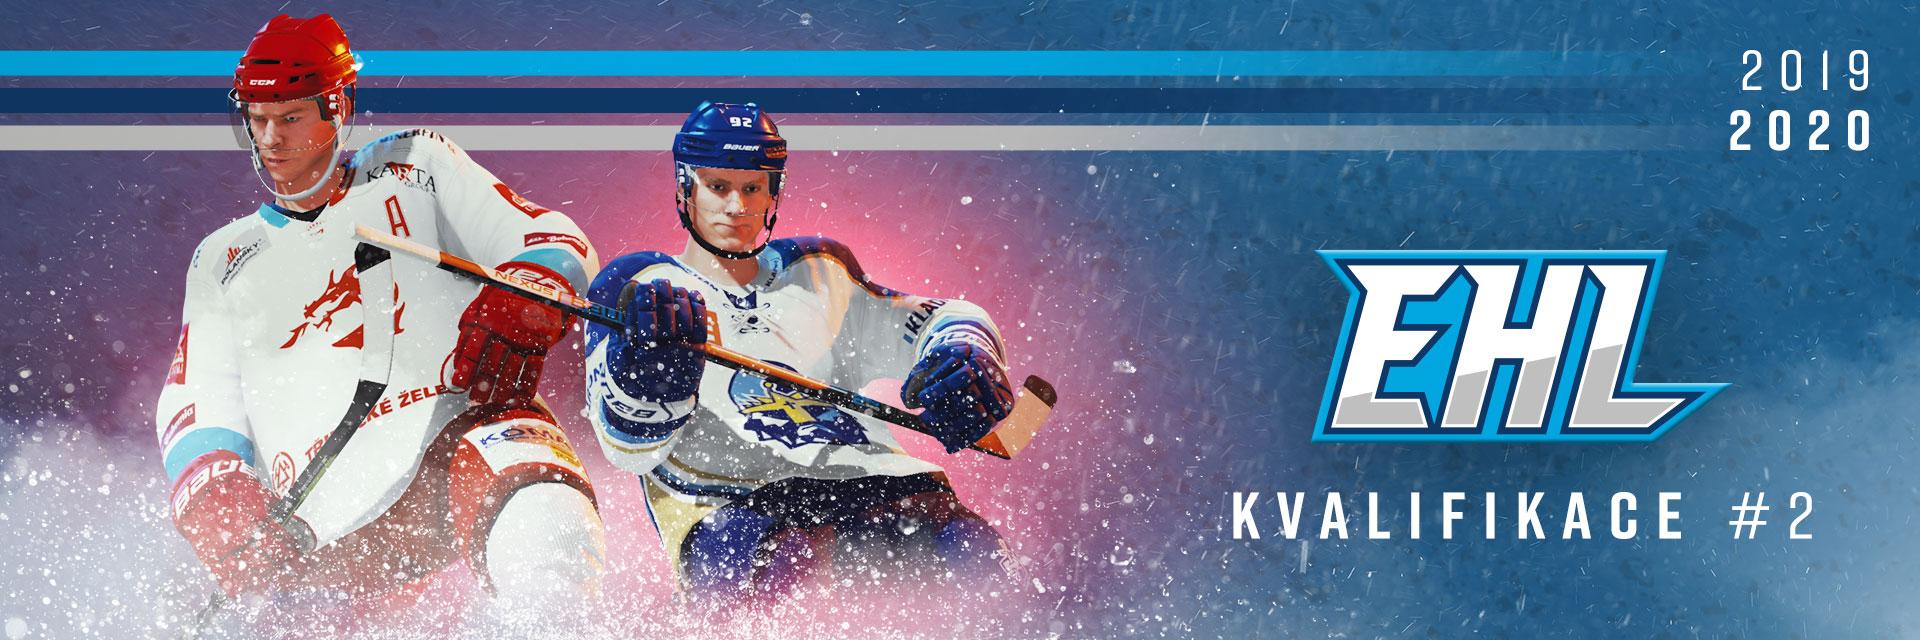 esport-hokejova-liga-kvalifikace-2